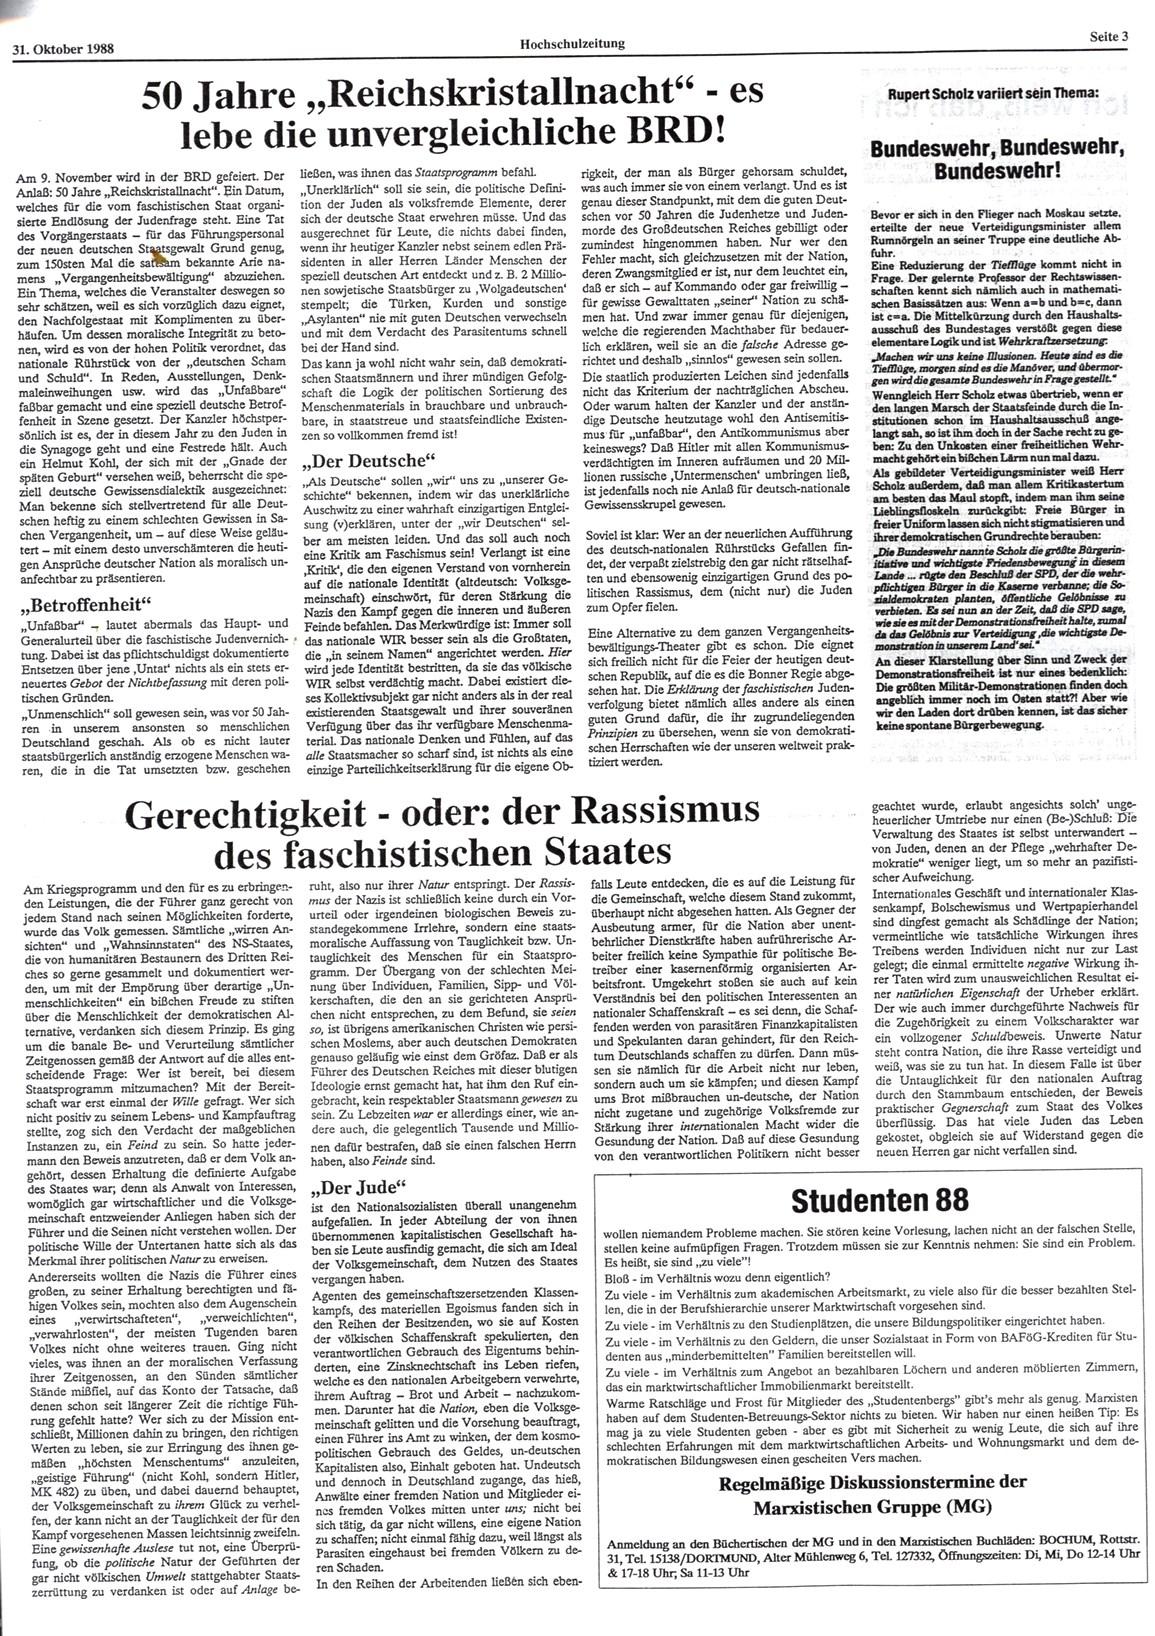 Bochum_BHZ_19881031_180_003